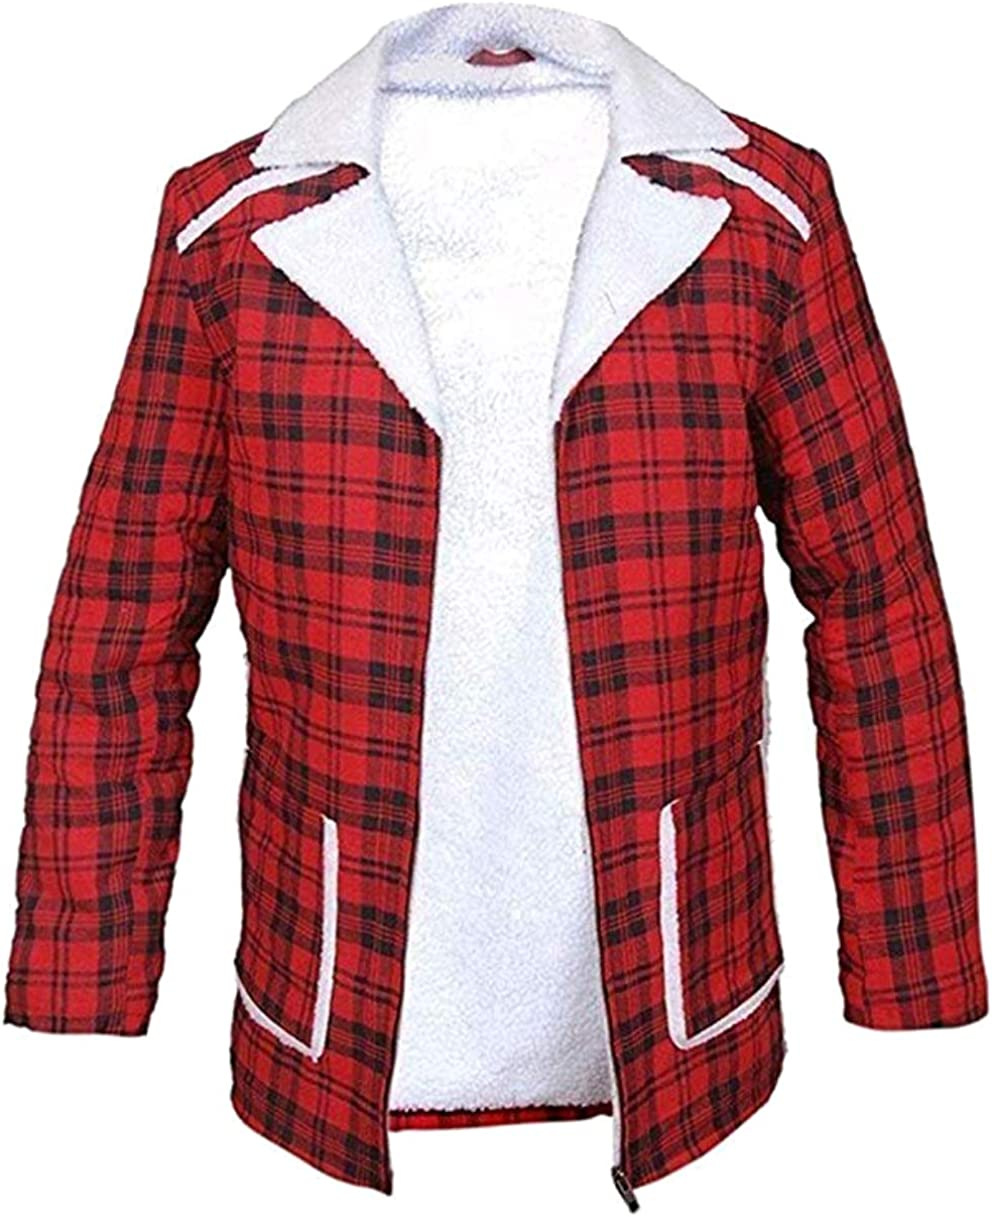 Flannel Checkered Jacket Red Coat Ryan Reynolds Deadpool Wilson Flannel Shearling Coat